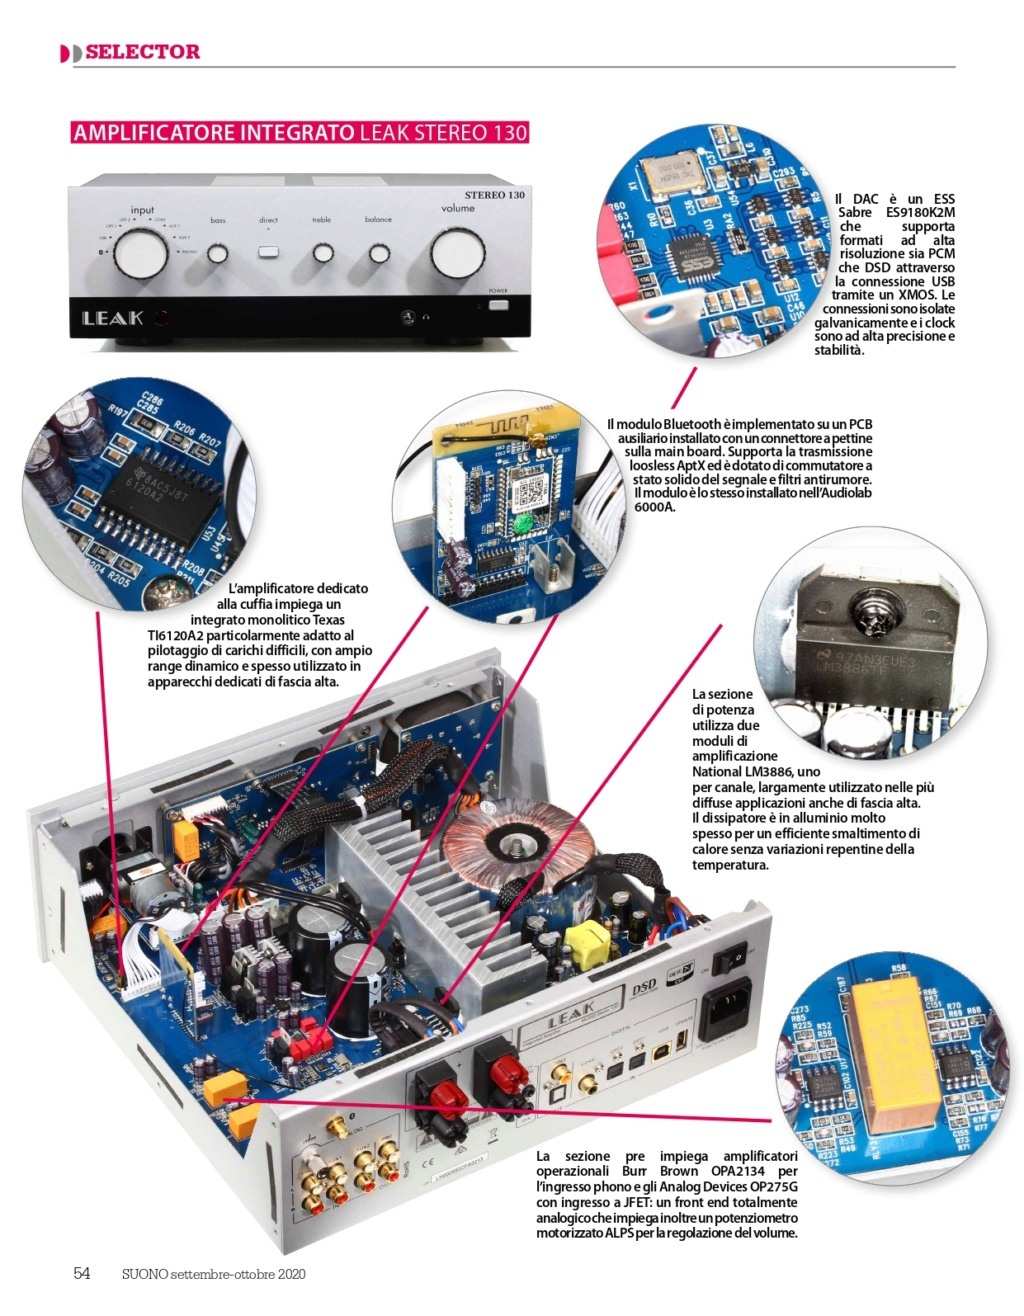 Leak está de vuelta: nuevos modelos Stereo 130 y CDT Leak_s10